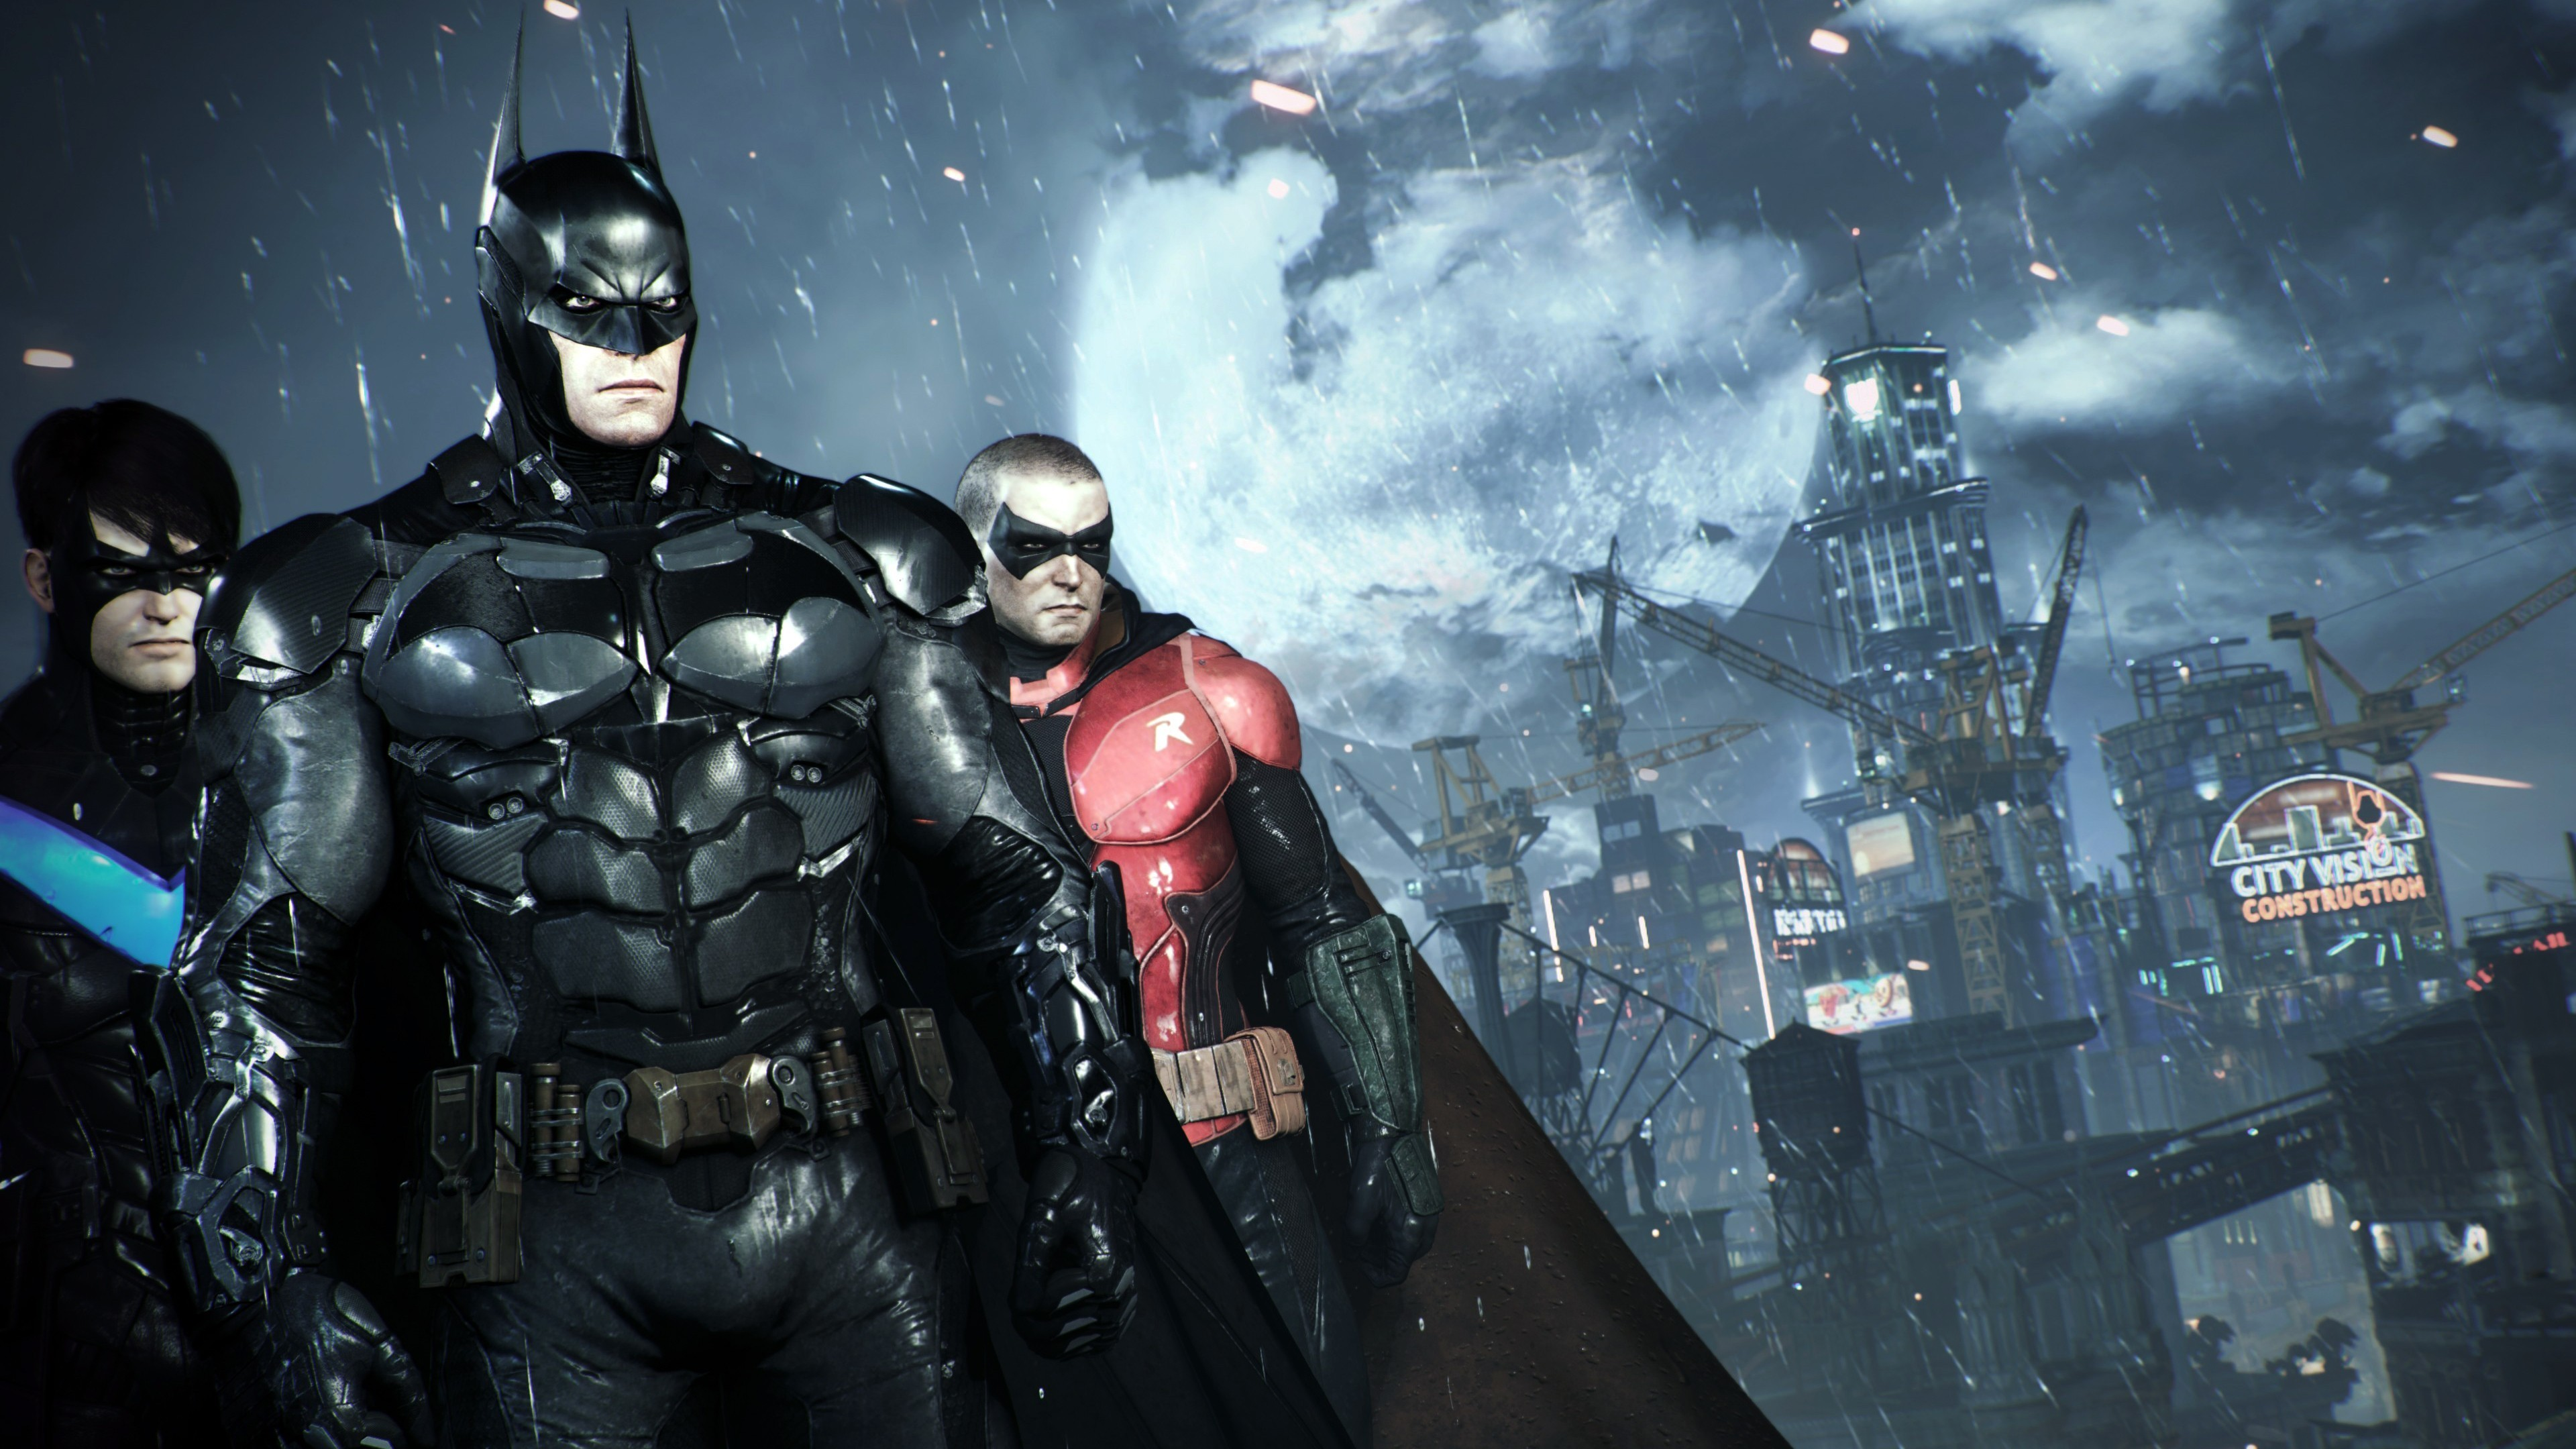 Batman Arkham Knight 4k Hd Desktop Wallpaper For Ultra 113402